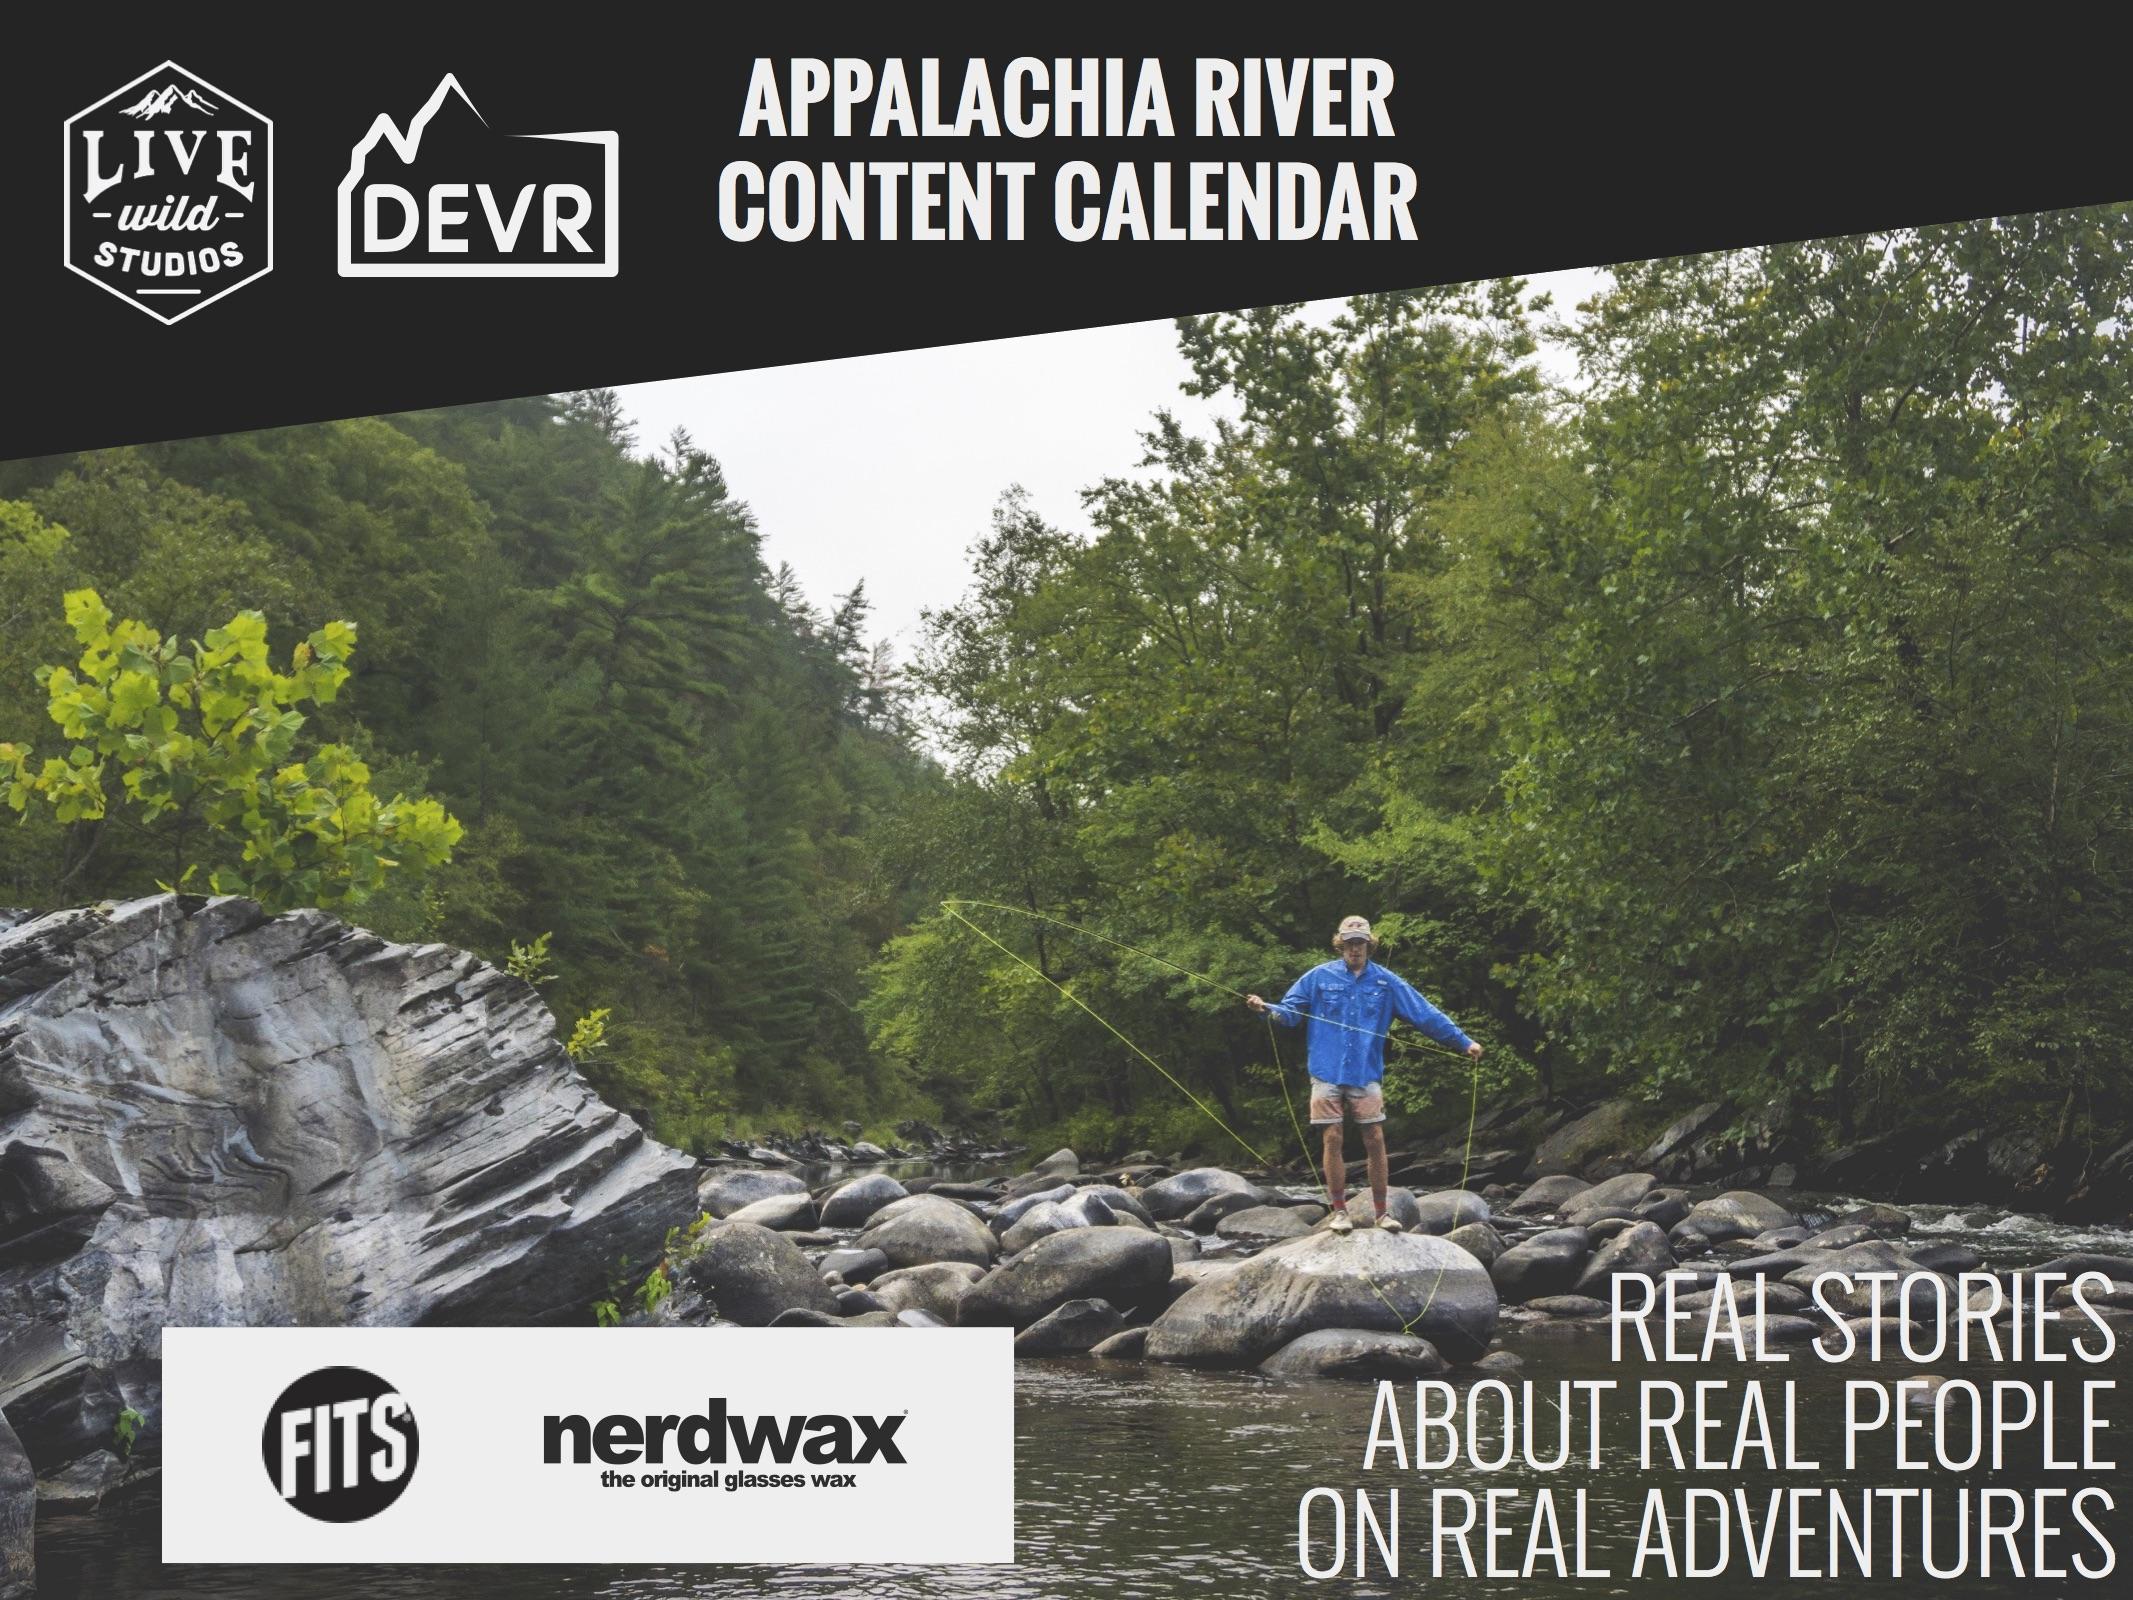 Appalachia River Adventure 2016 Campaign Guide 1.jpg